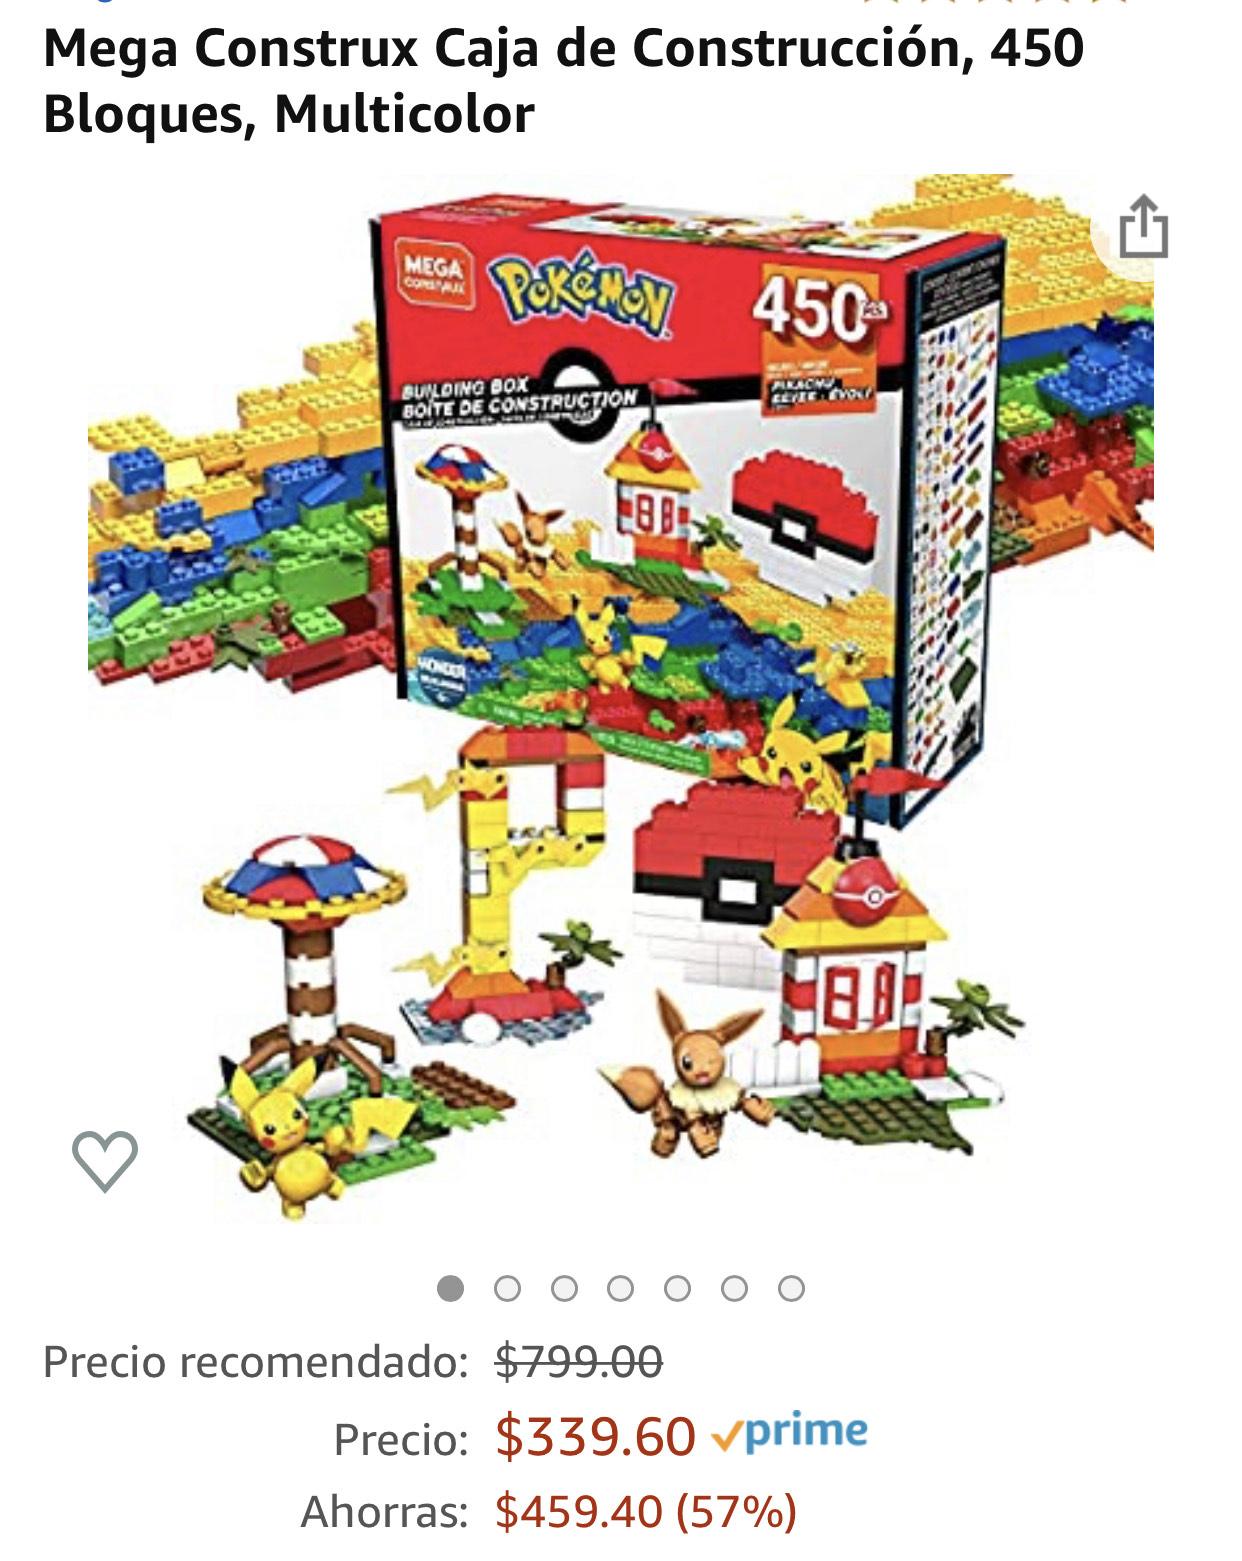 Amazonmx: Mega Construx Pokemon 450 piezas